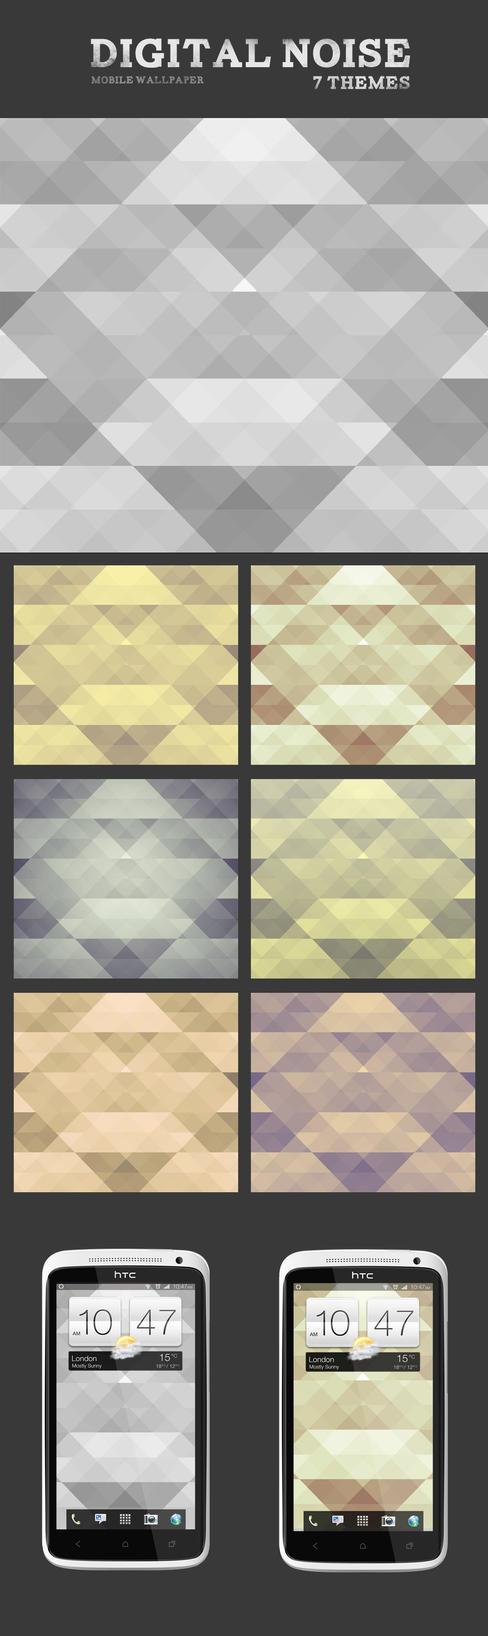 Digital Noise Mobile Wallpaper by Martz90